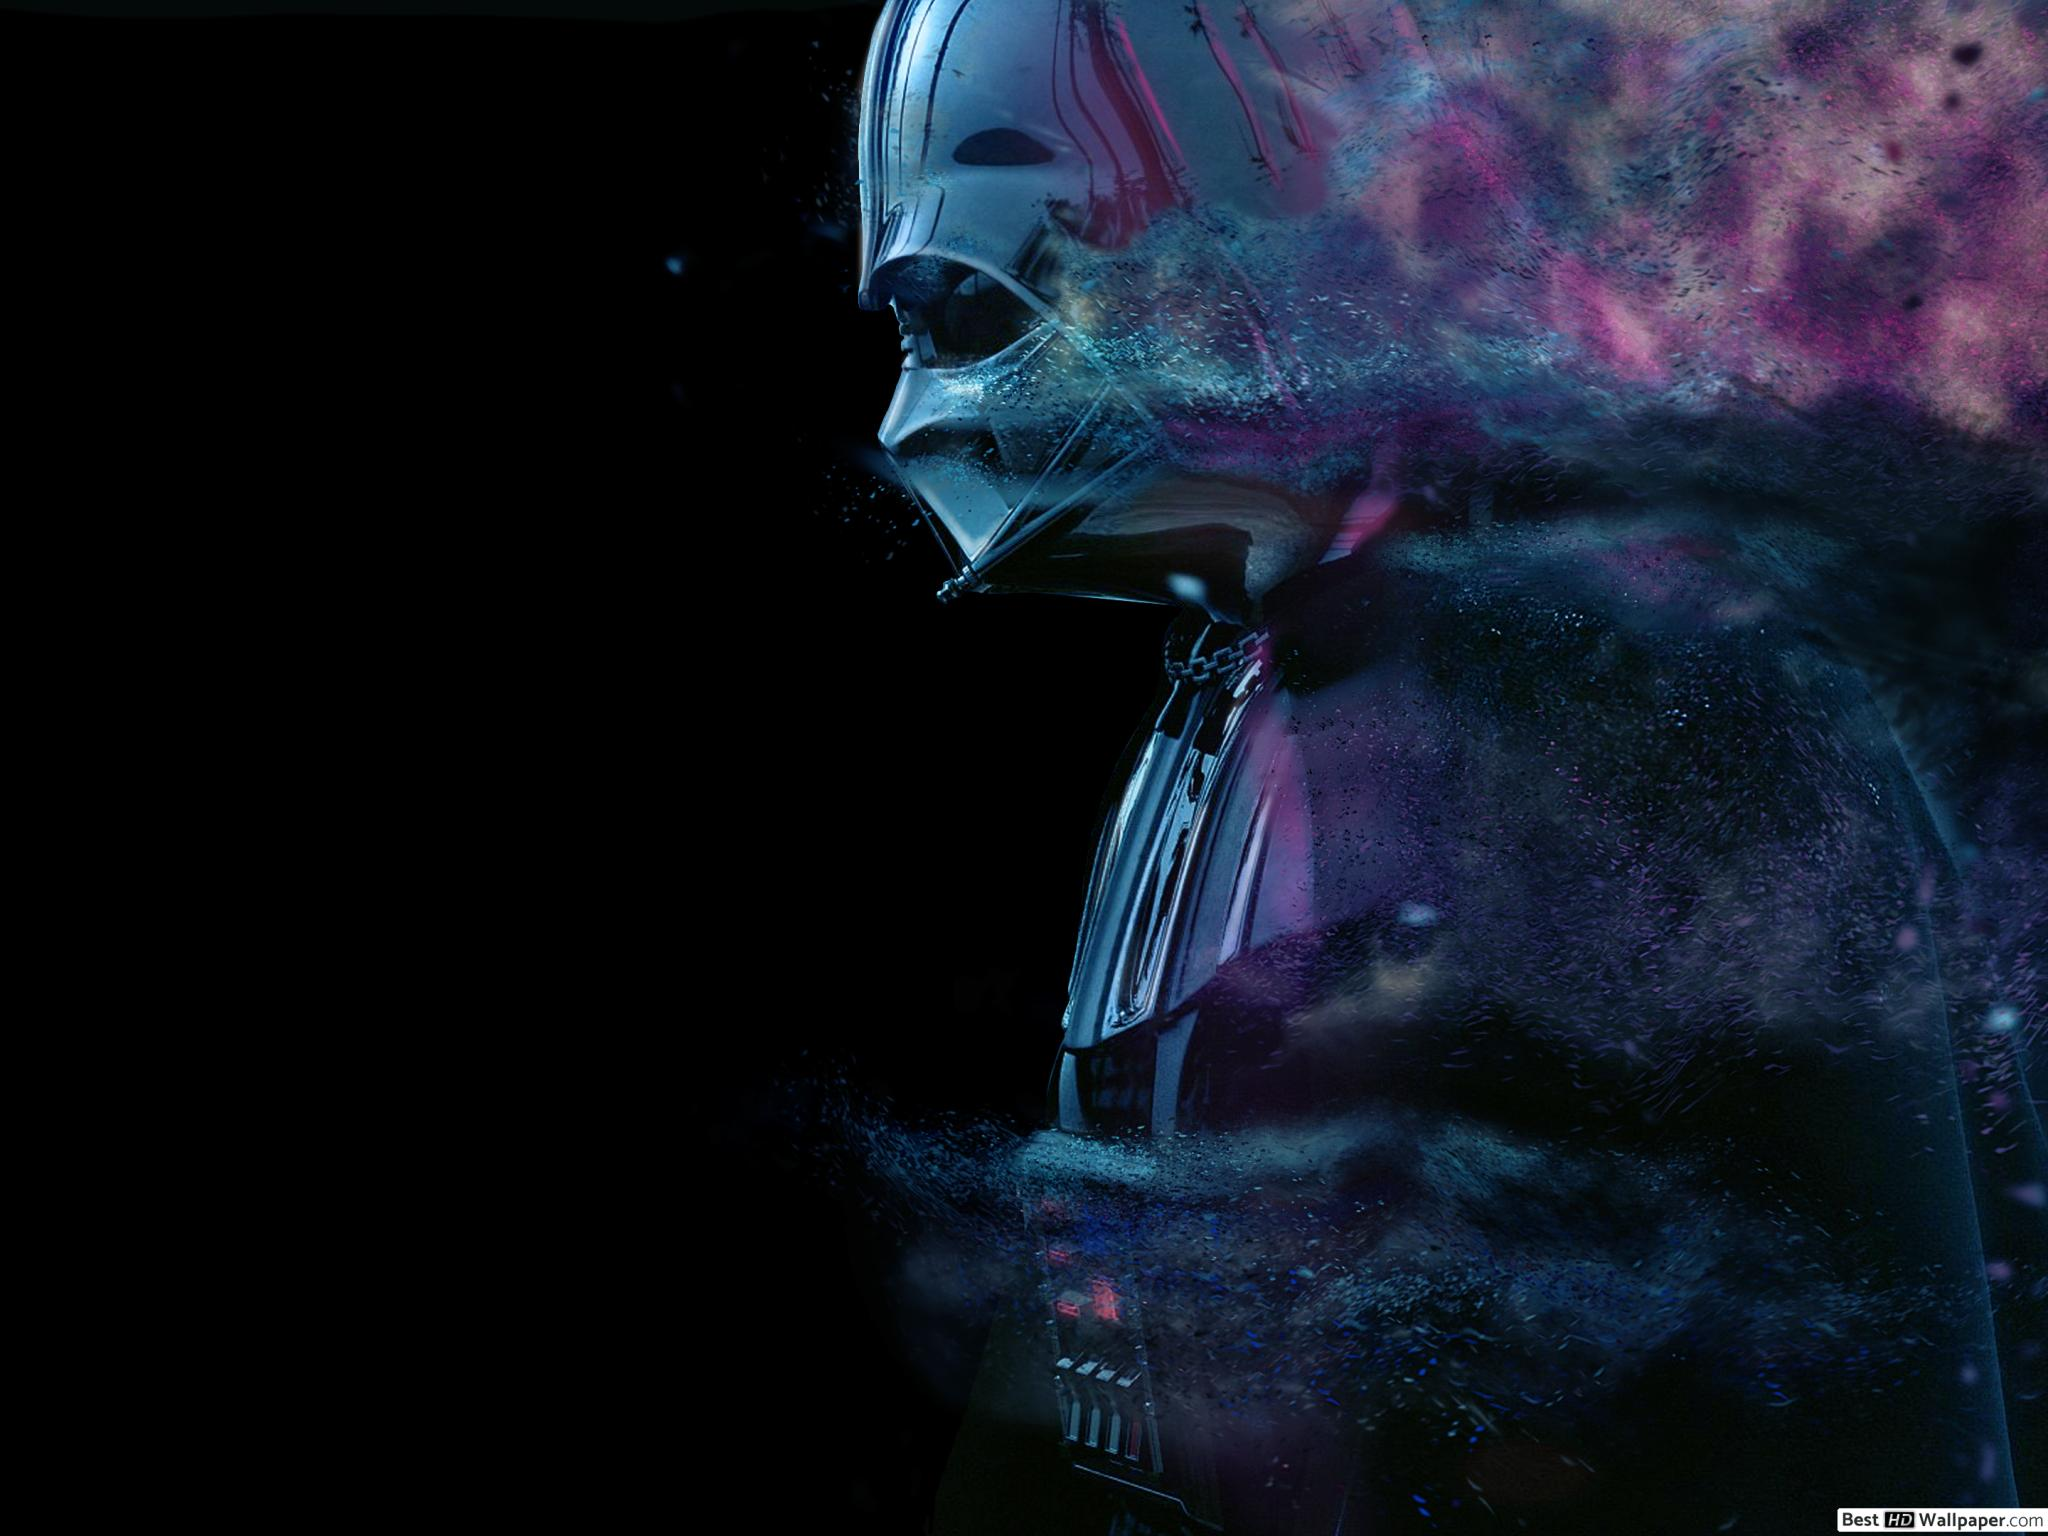 Darth Vader Android Wallpaper 2048x1536 Download Hd Wallpaper Wallpapertip